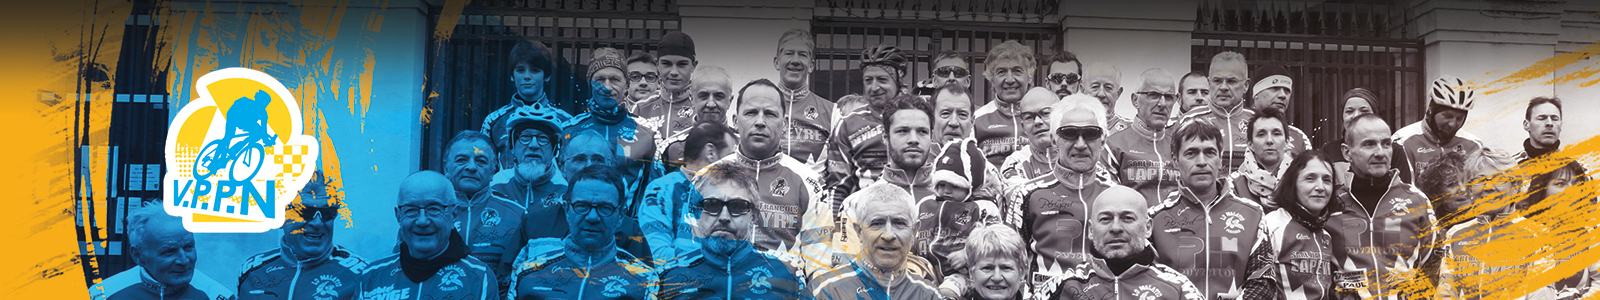 VELO PASSION PERIGORD NONTRONNAIS : site officiel du club de cyclisme de NONTRON - clubeo